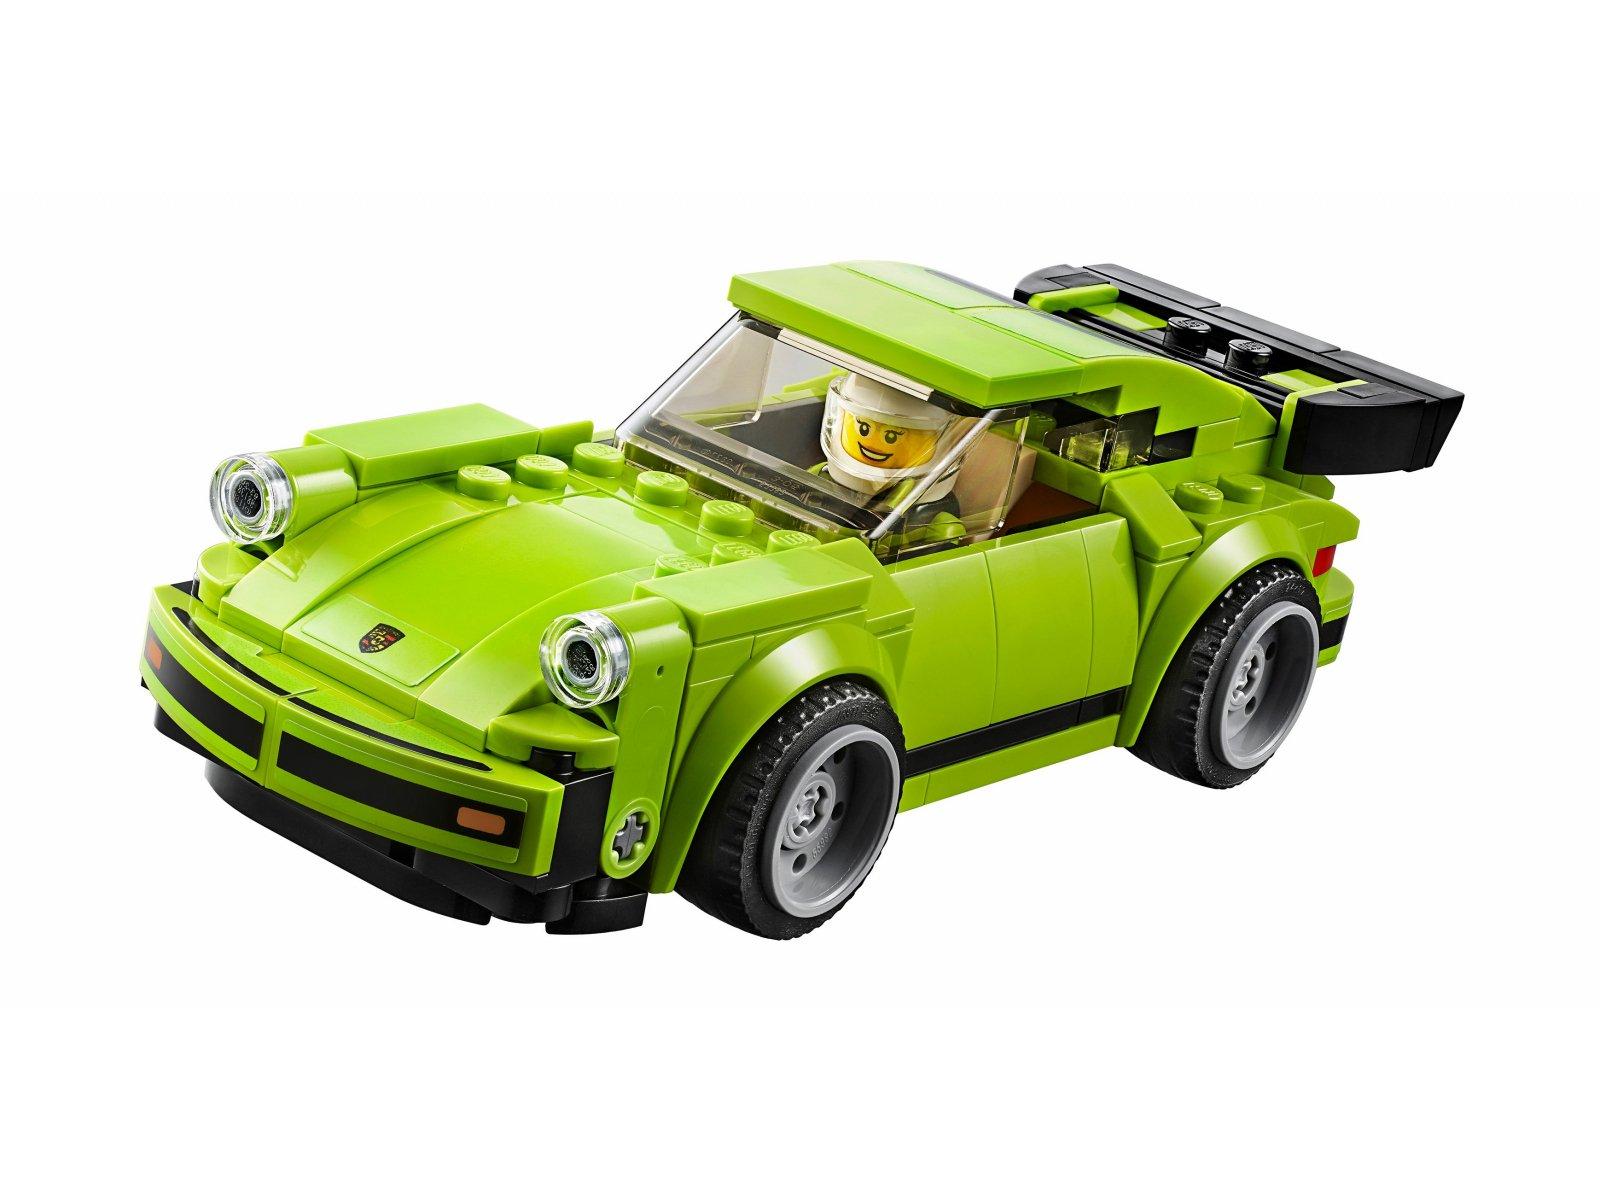 LEGO 75888 Porsche 911 RSR i 911 Turbo 3.0